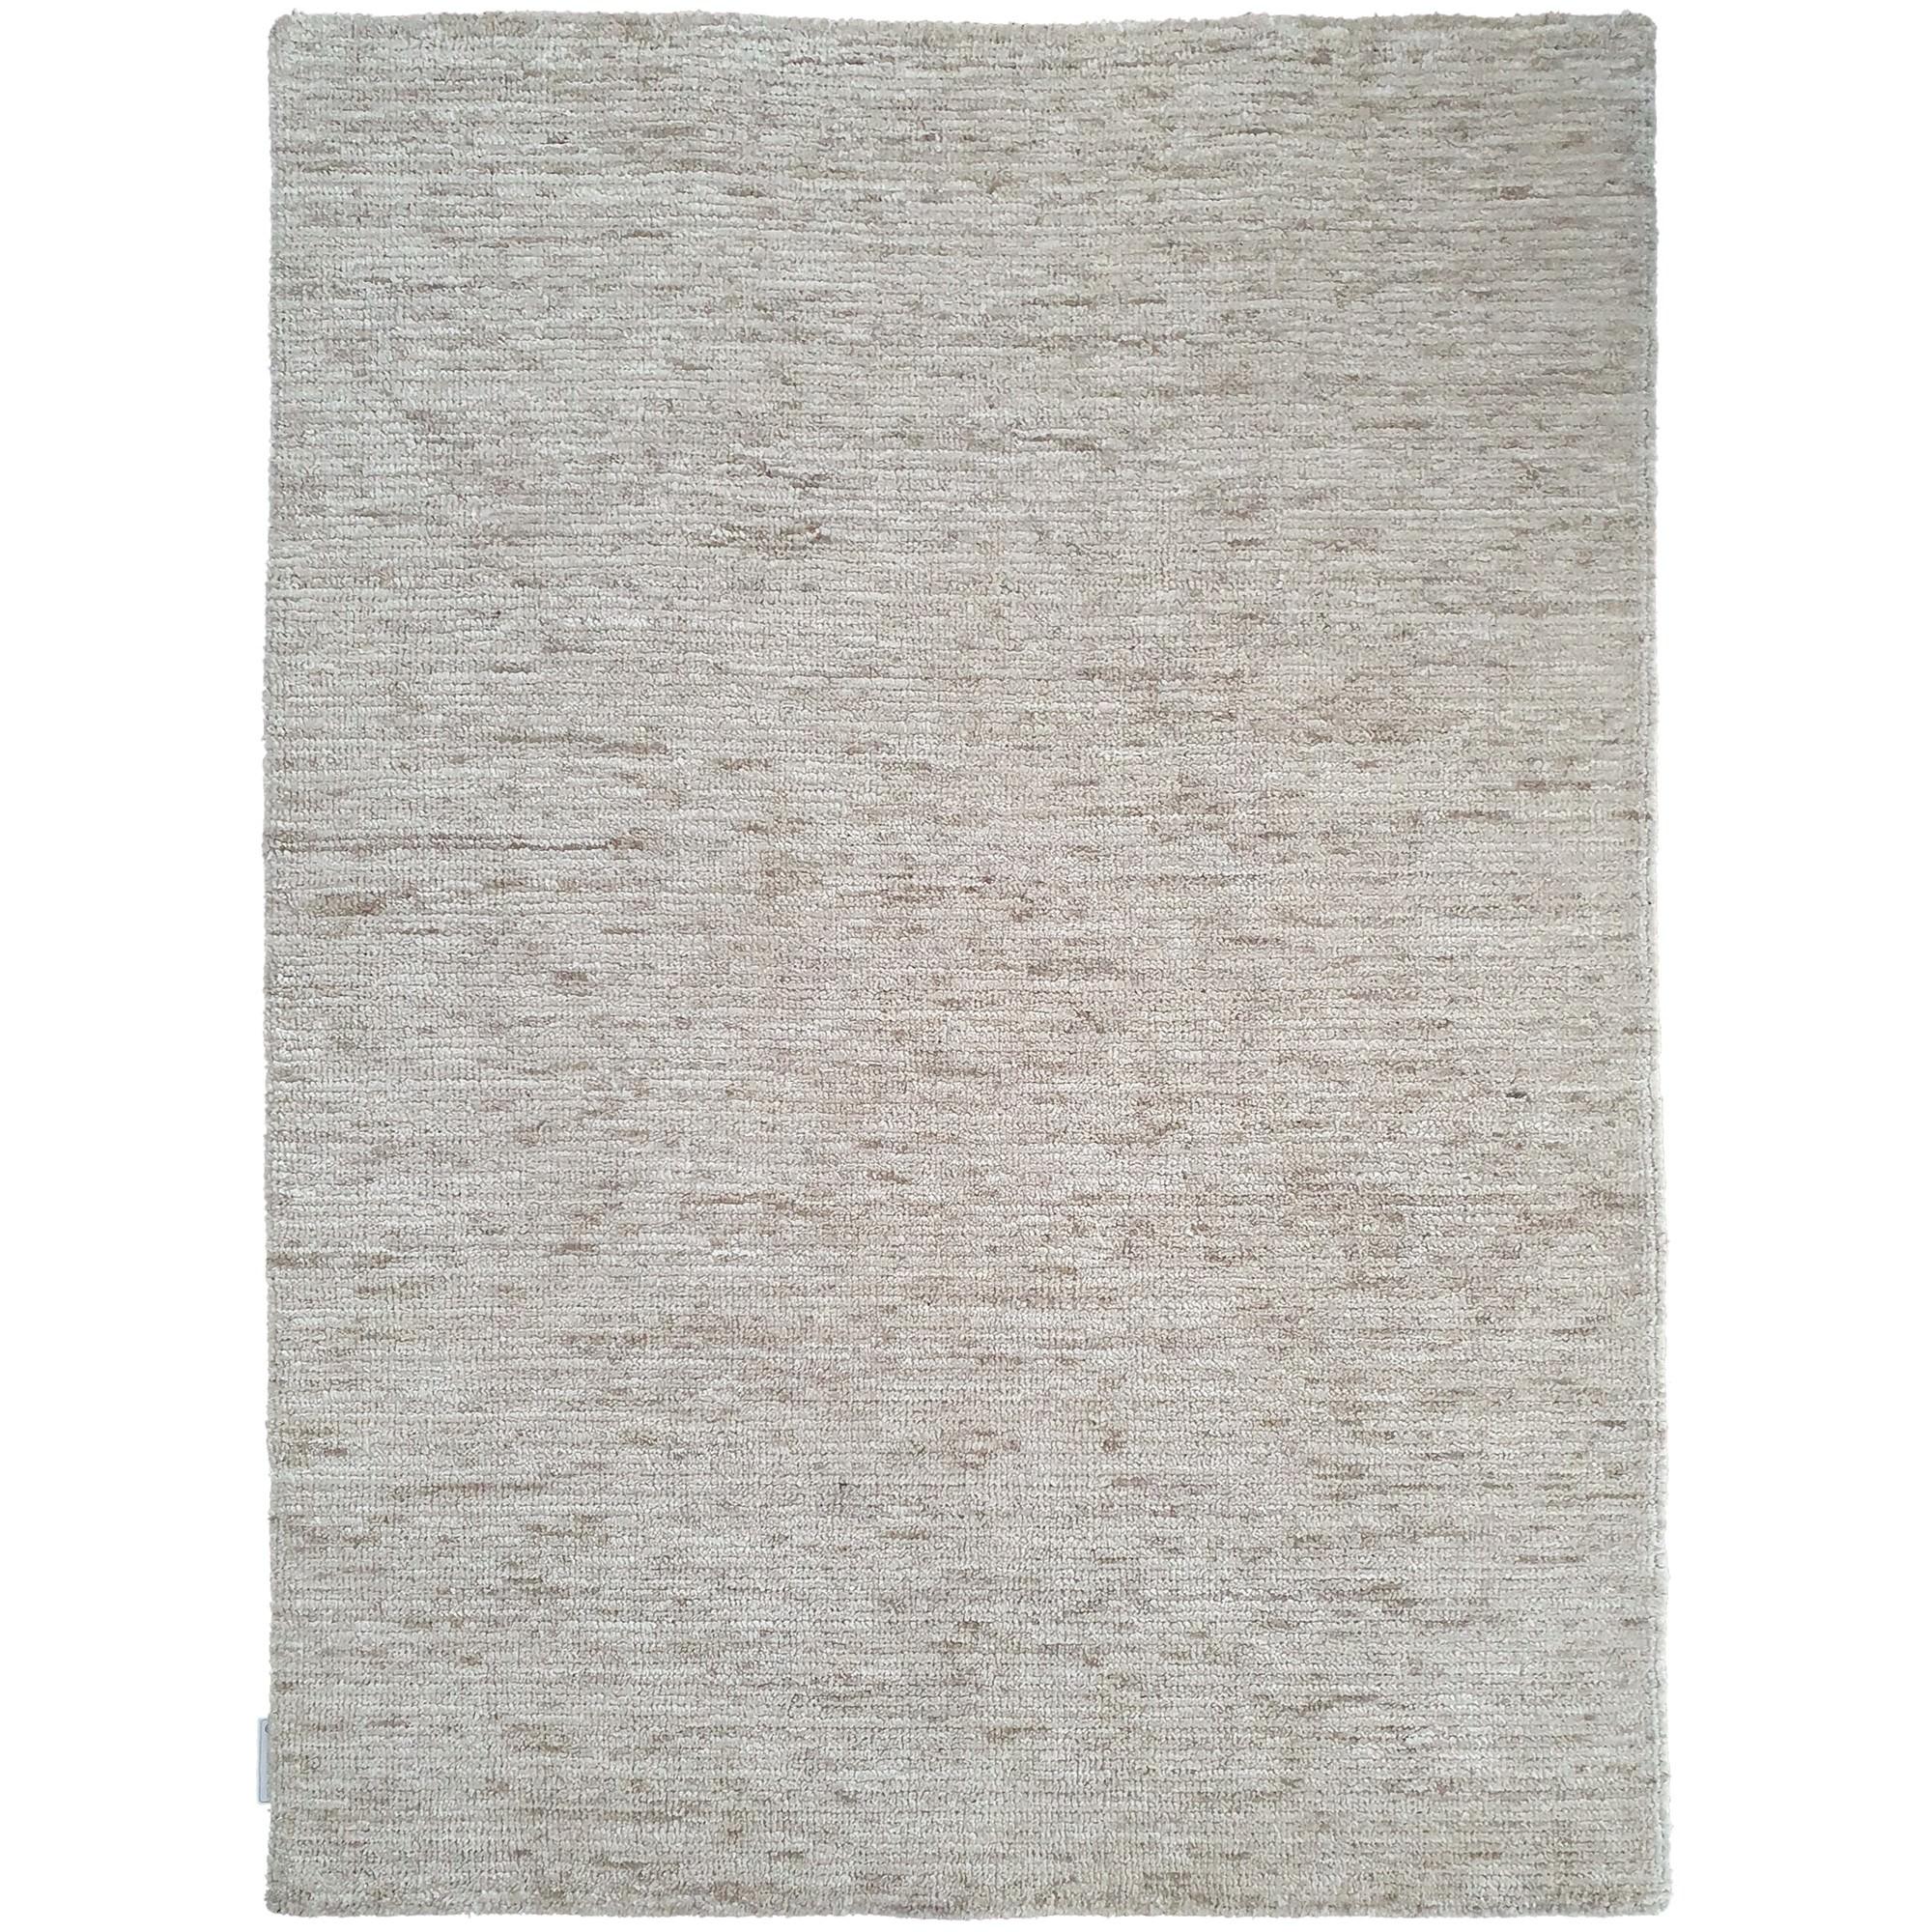 Ascot No.811 Handmade Wool Rug, 160x110cm, Caramel